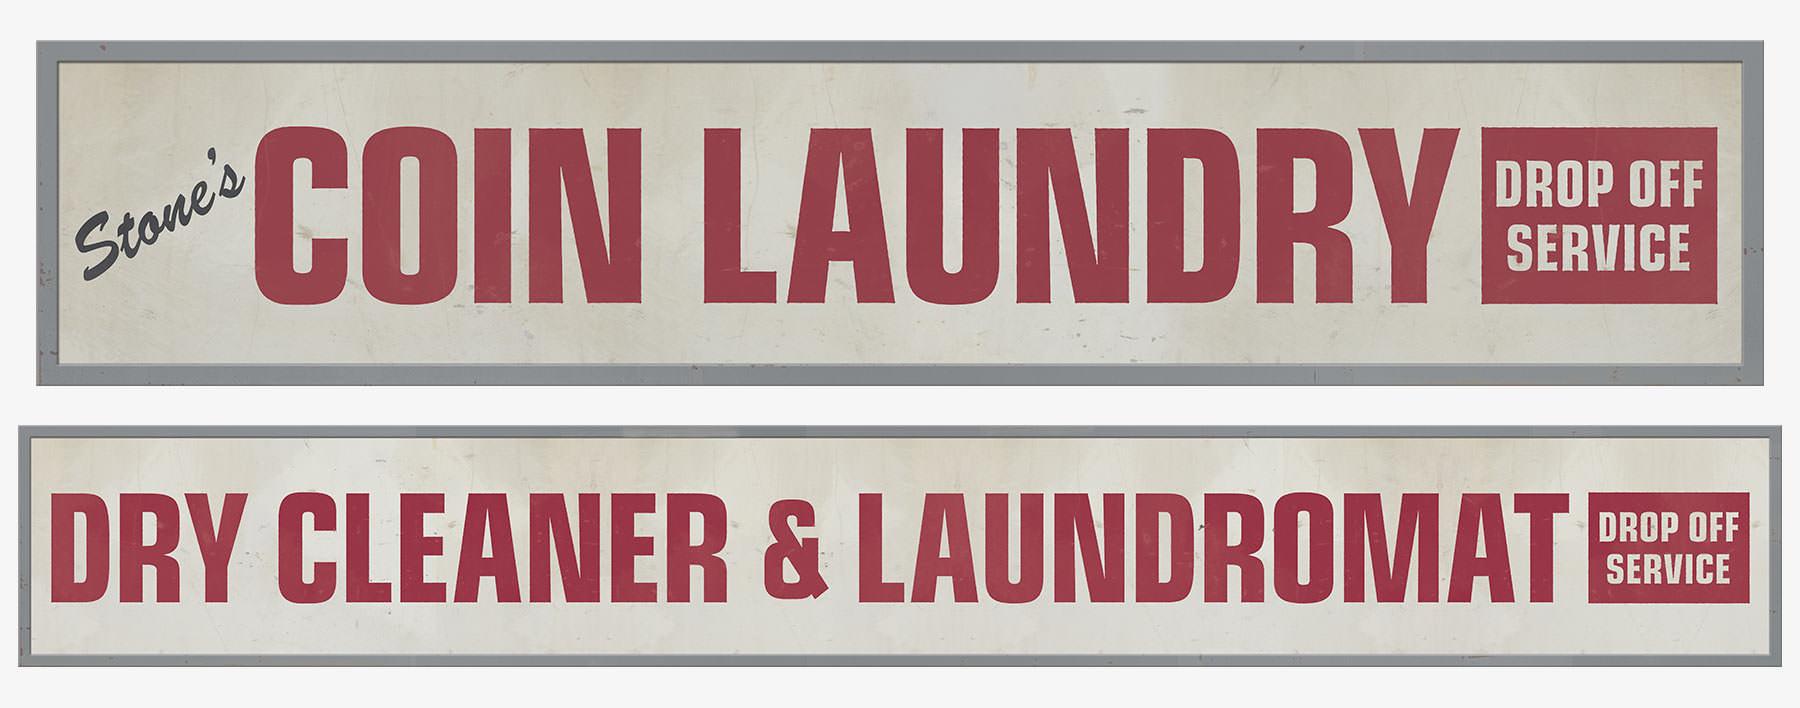 Biscuit Toyota Laundromat Set Signage